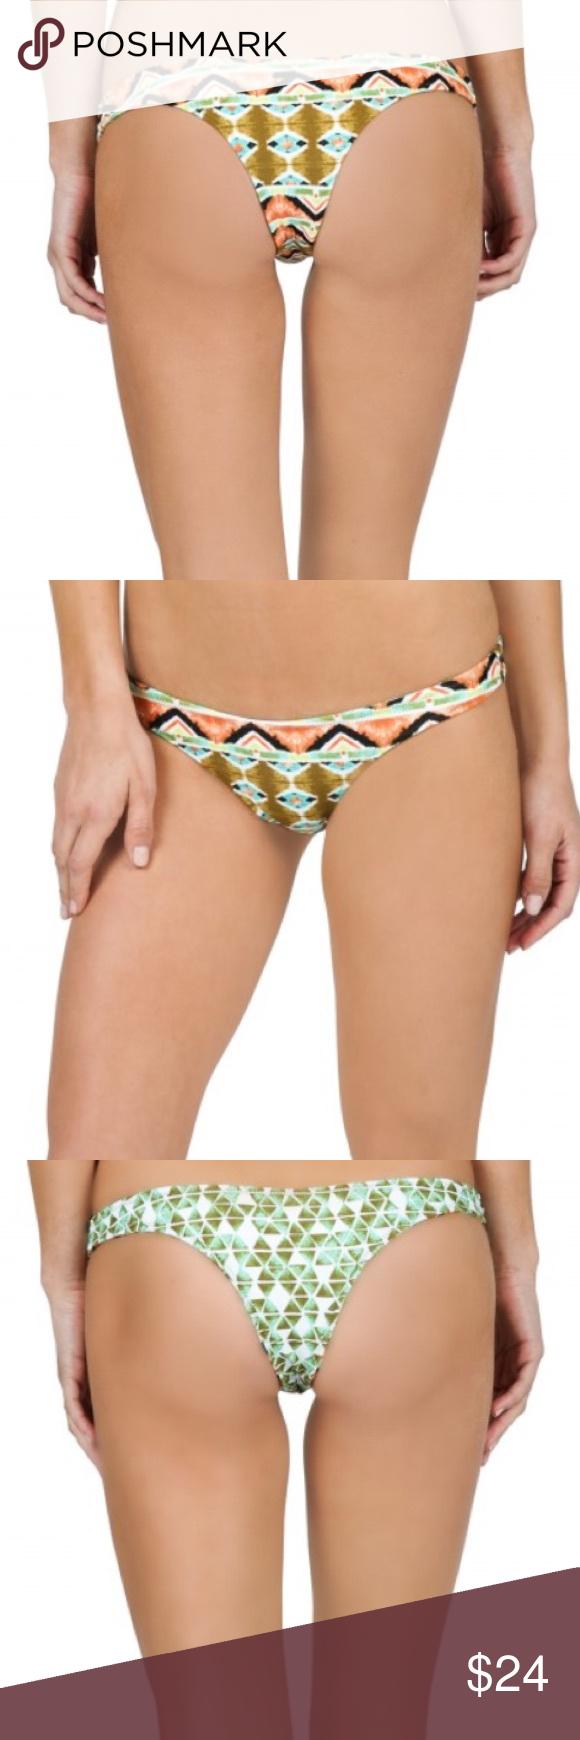 233c946f826f8 Volcom Reservable bikini bottoms For the truly brave